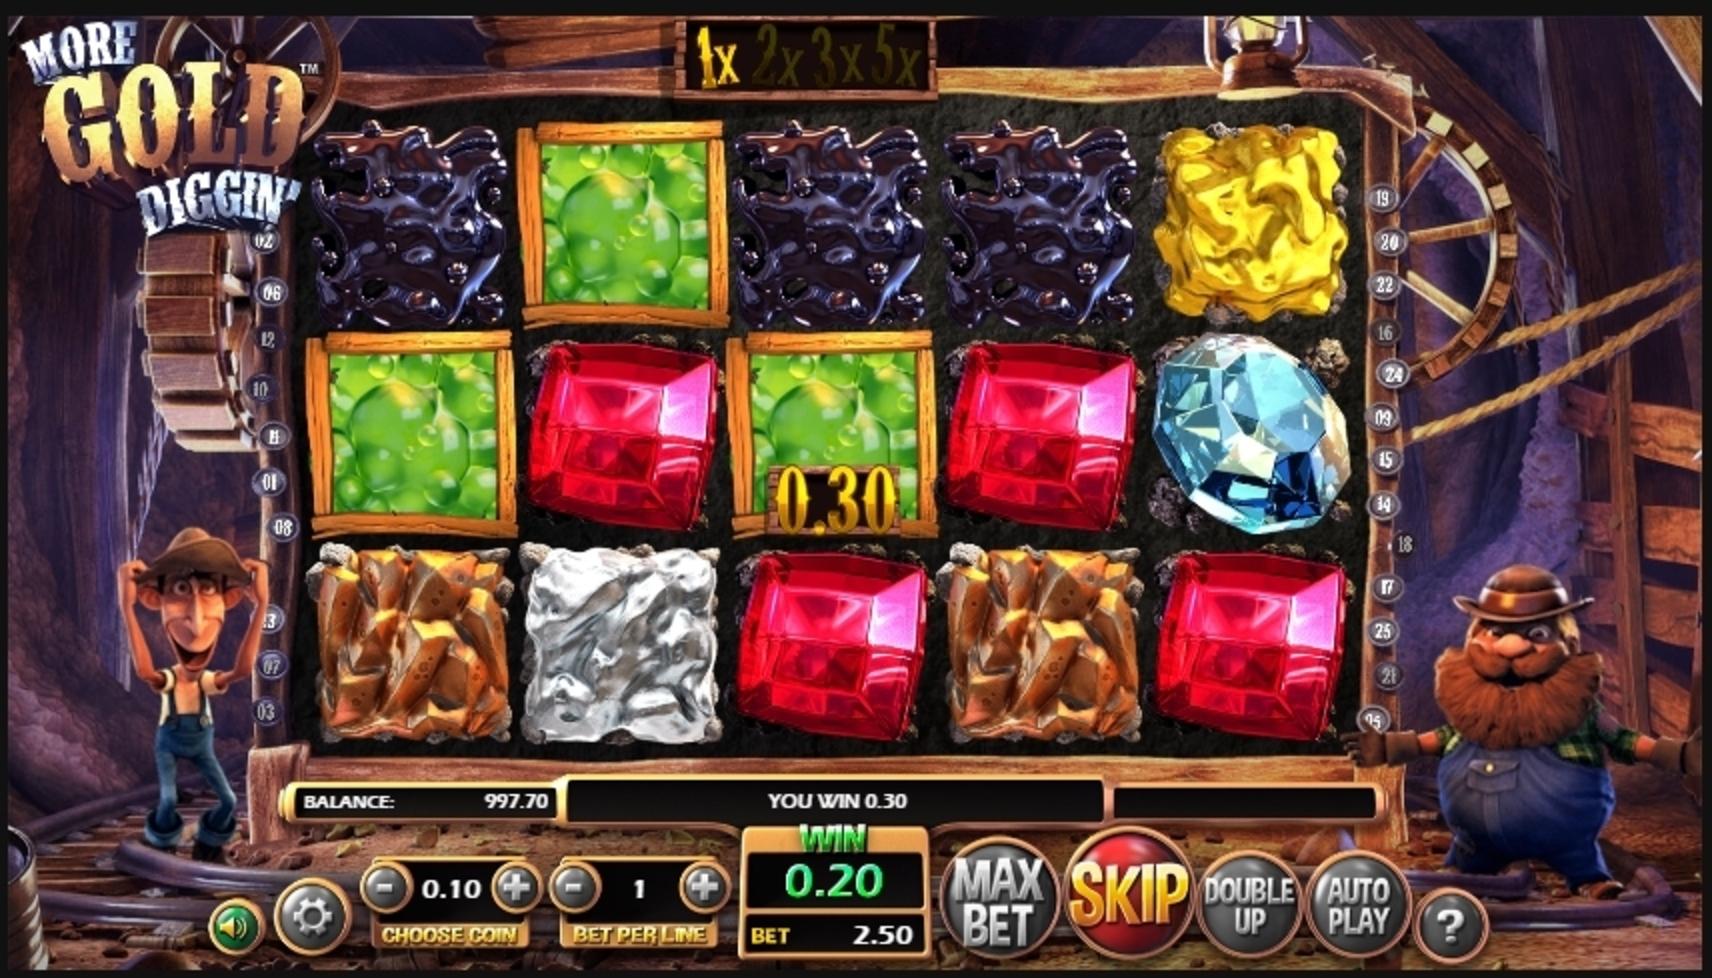 More Gold Diggin Slot Machine